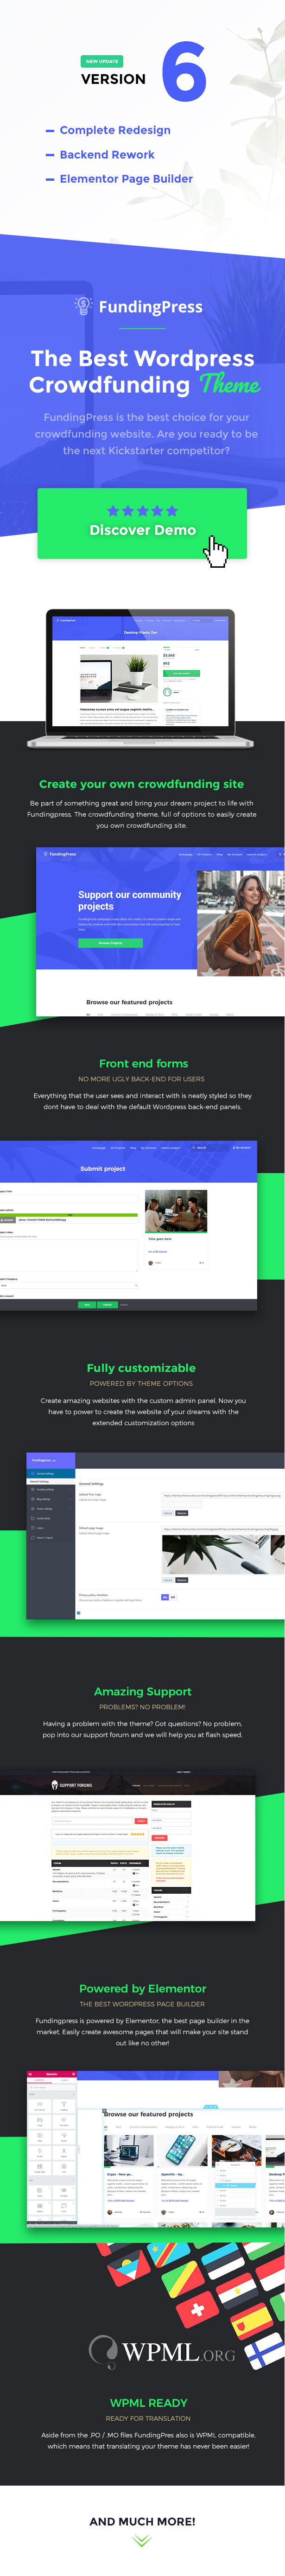 Fundingpress - The Crowdfunding WordPress Theme - 2